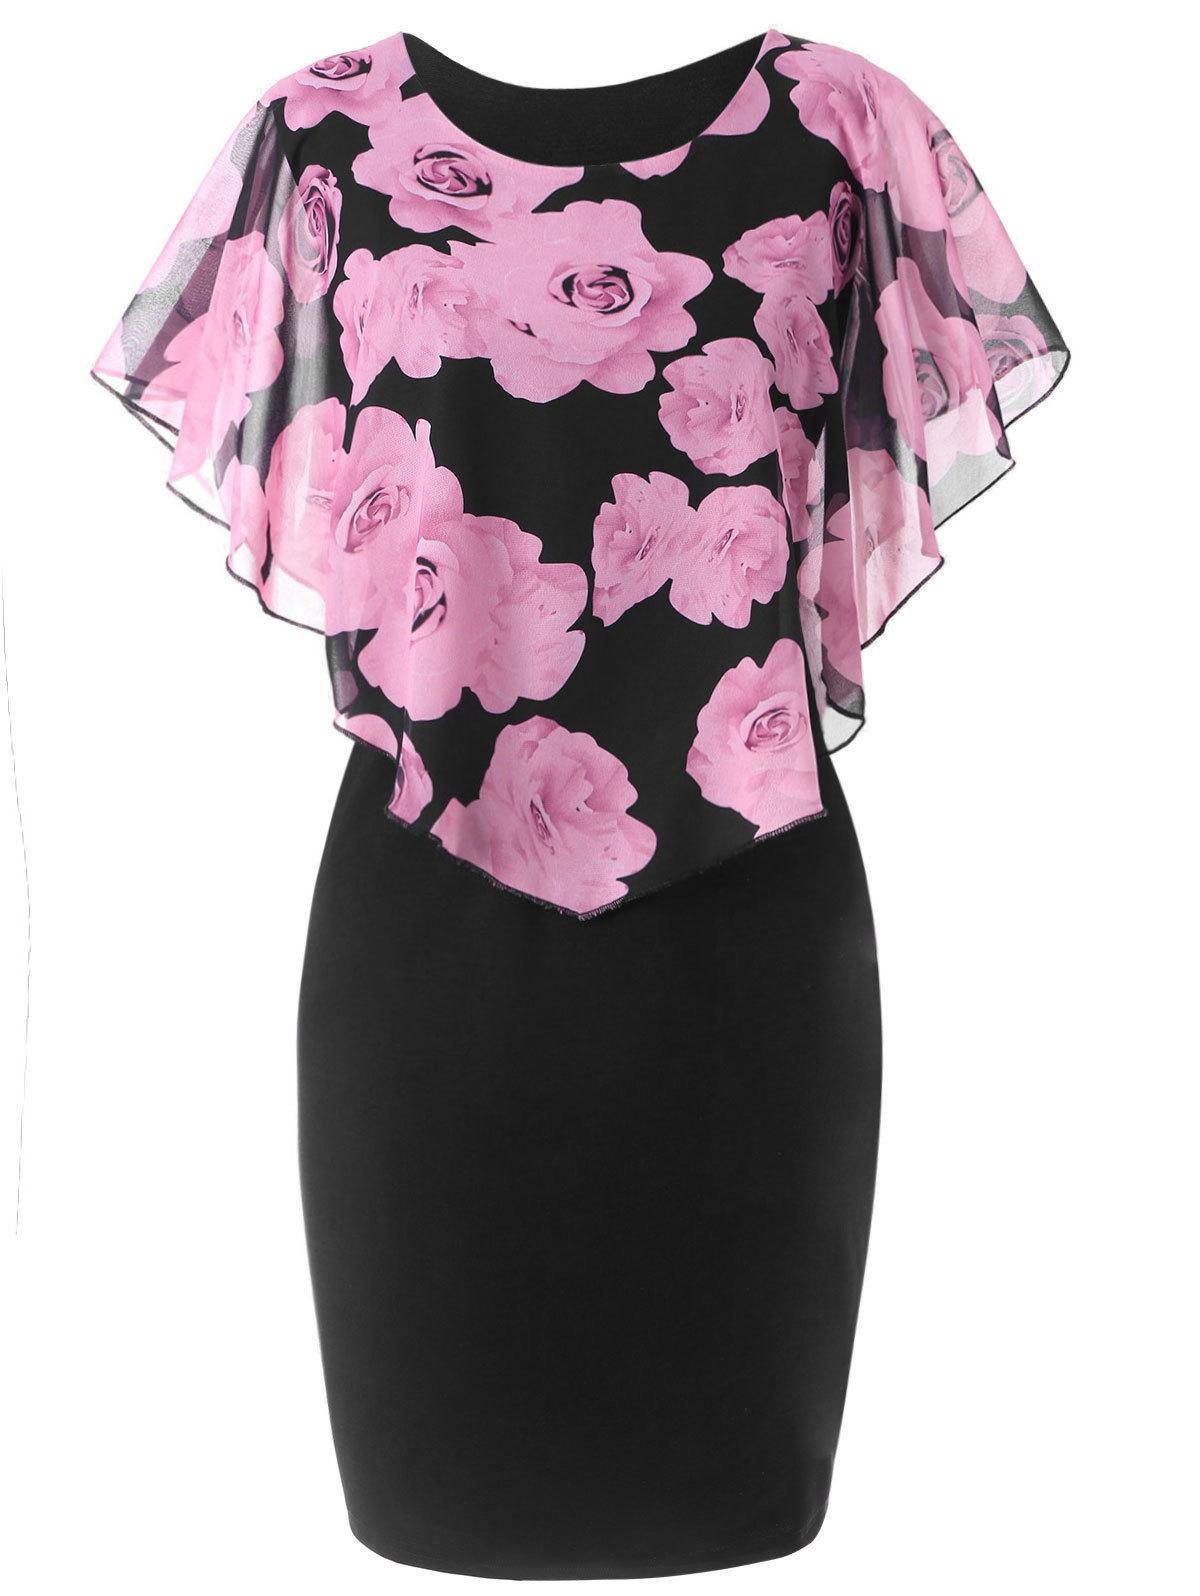 Wipalo Women Summer Dress Plus Size 5xl Rose Valentine Overlay Capelet Clothing Chiffon Elegant Midi Party Pencil Dress Vestidos SH190706